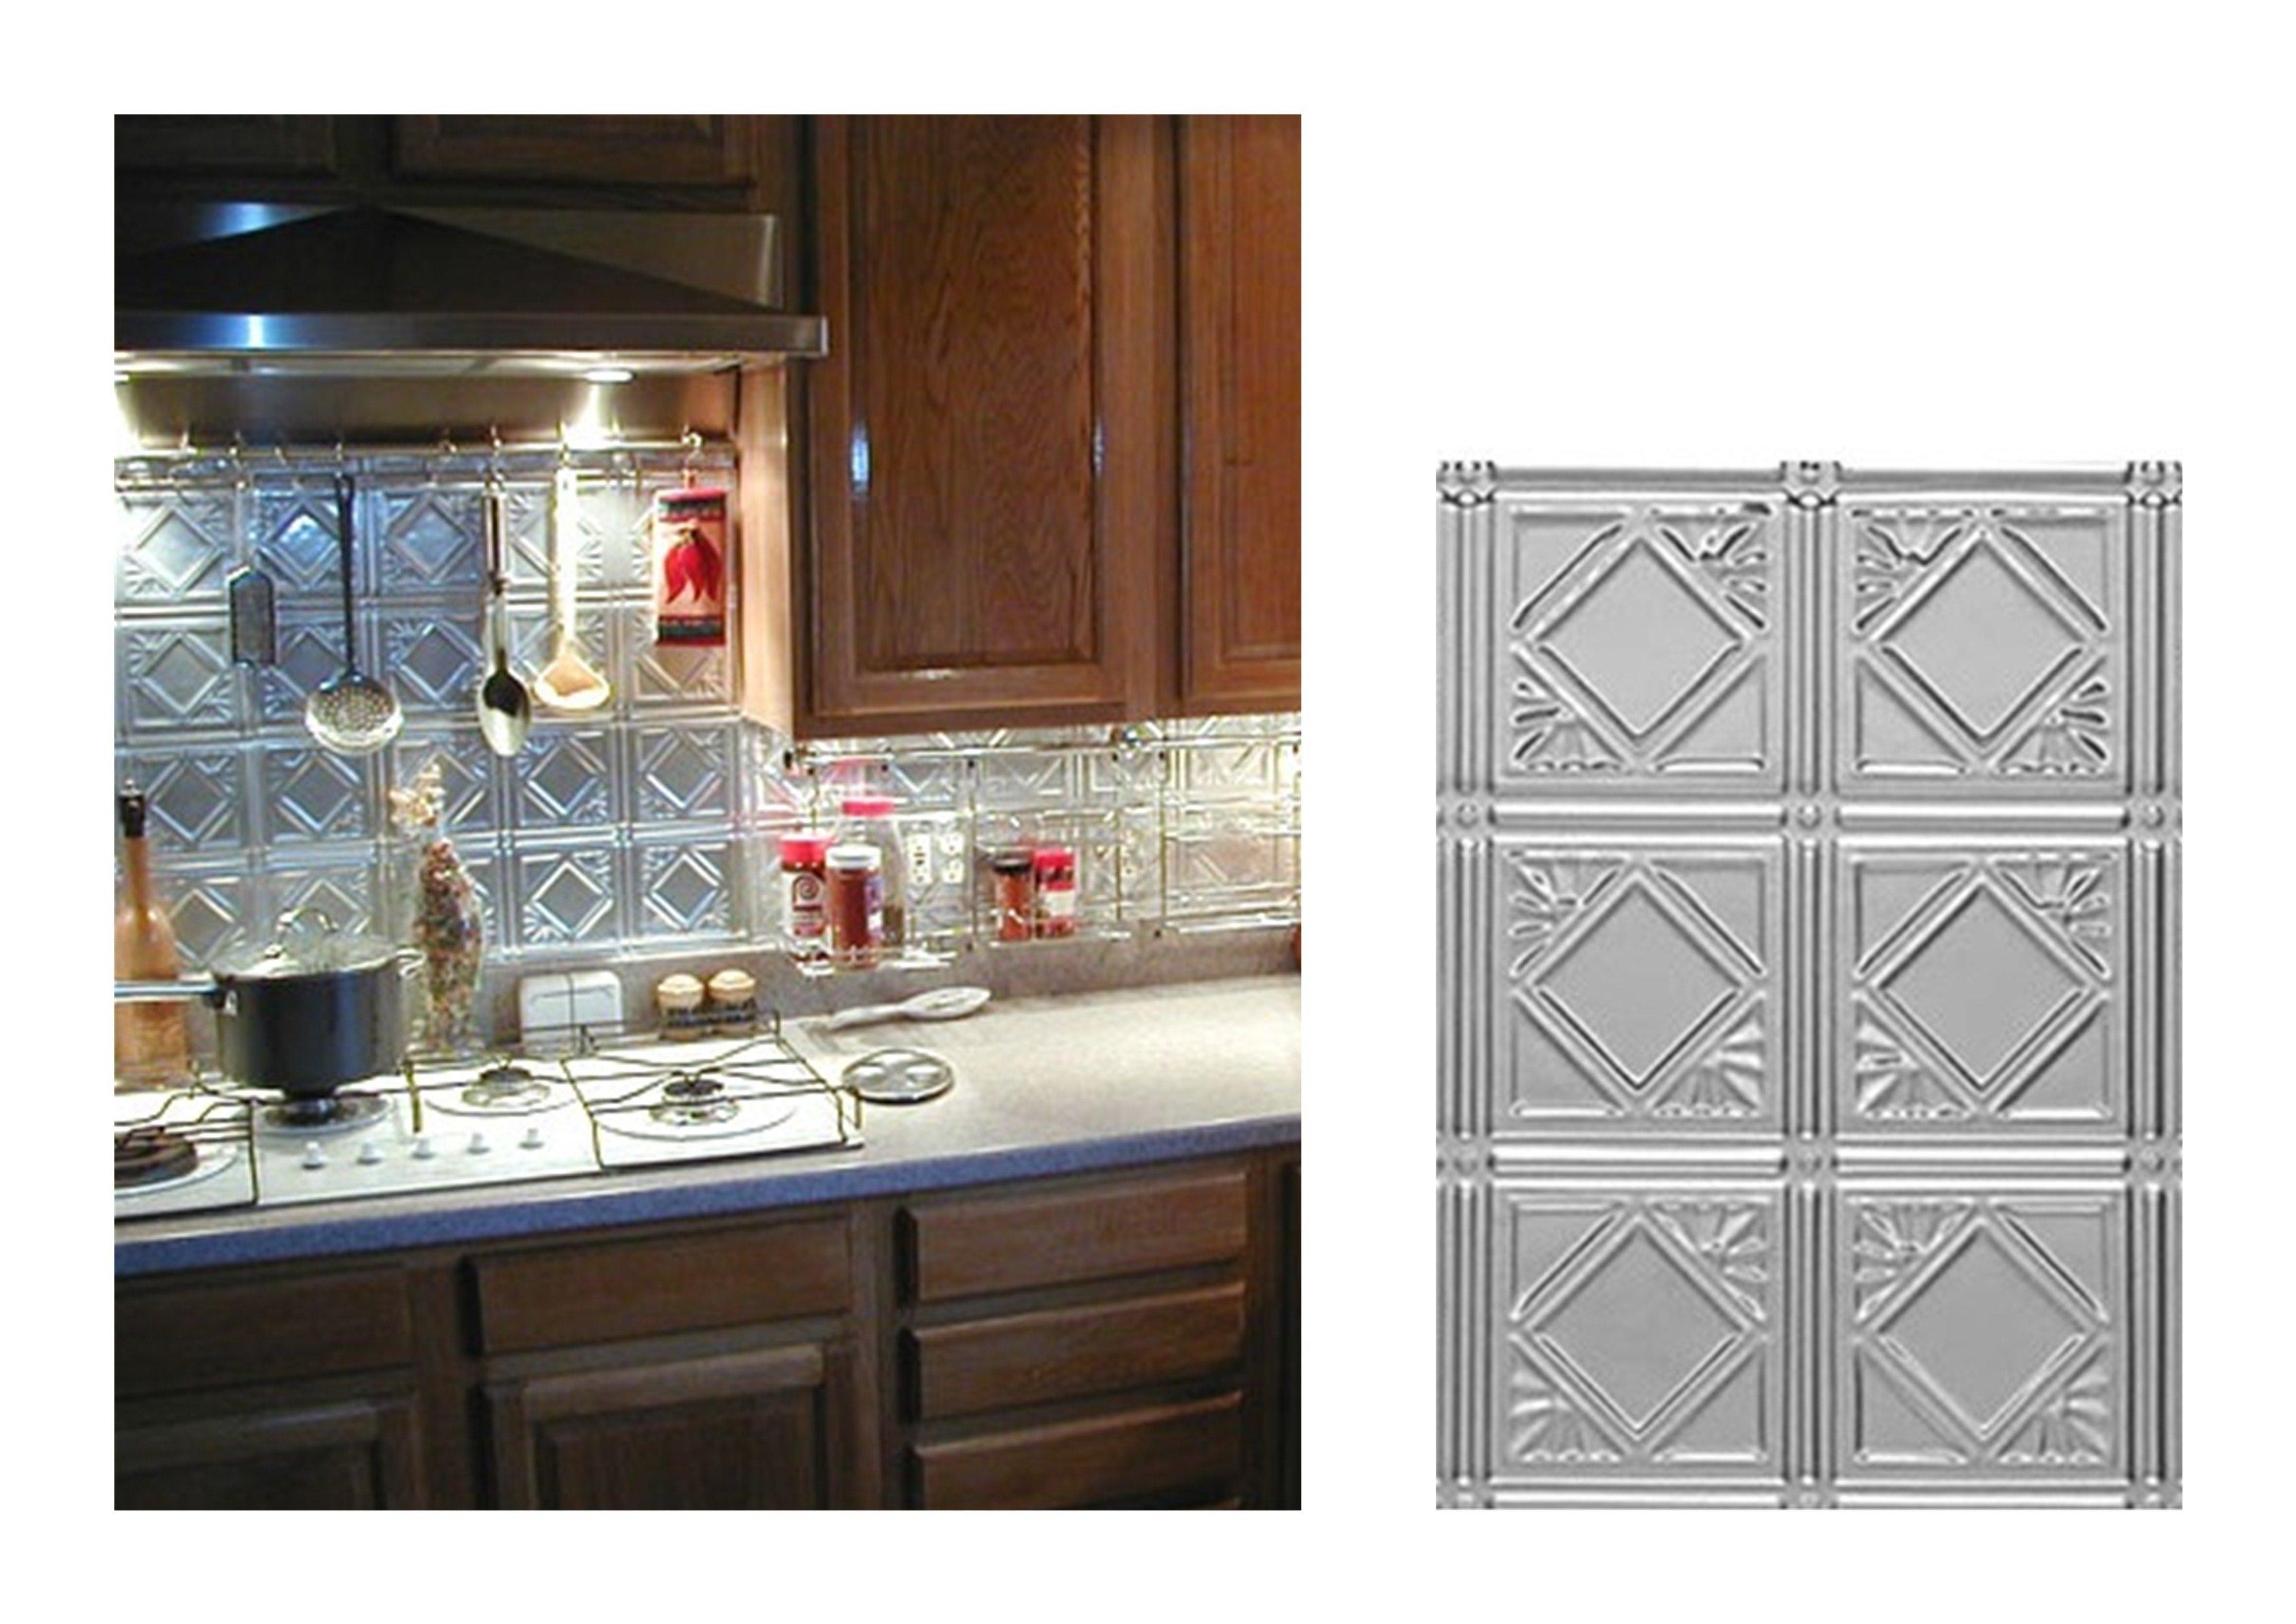 aluminum backsplash kitchen - 28 images - our low budget kitchen ...